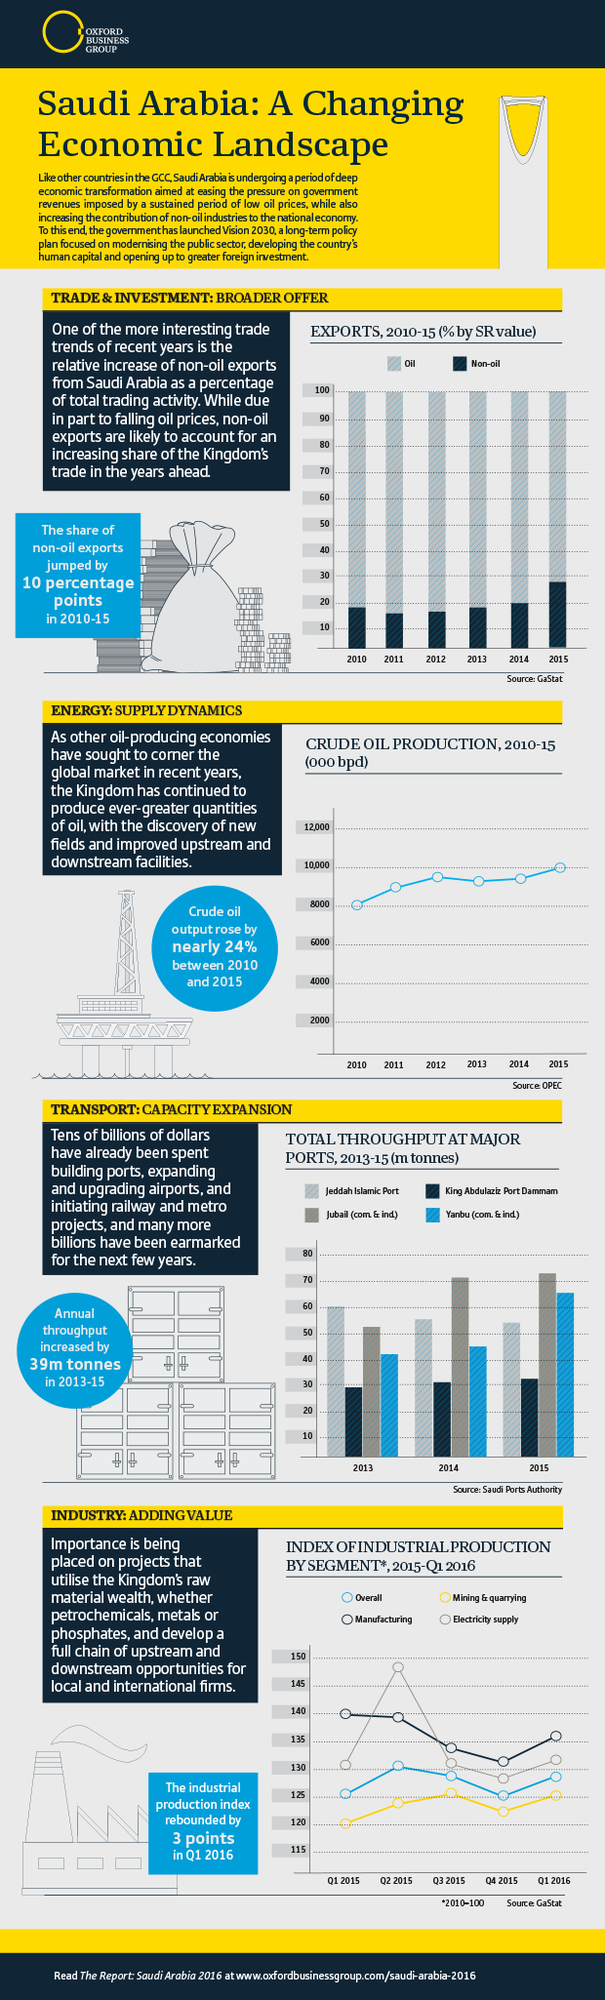 Saudi Arabia Economy Infographic 2016 A Changing Economic Landscape Economy Infographic Economy Infographic